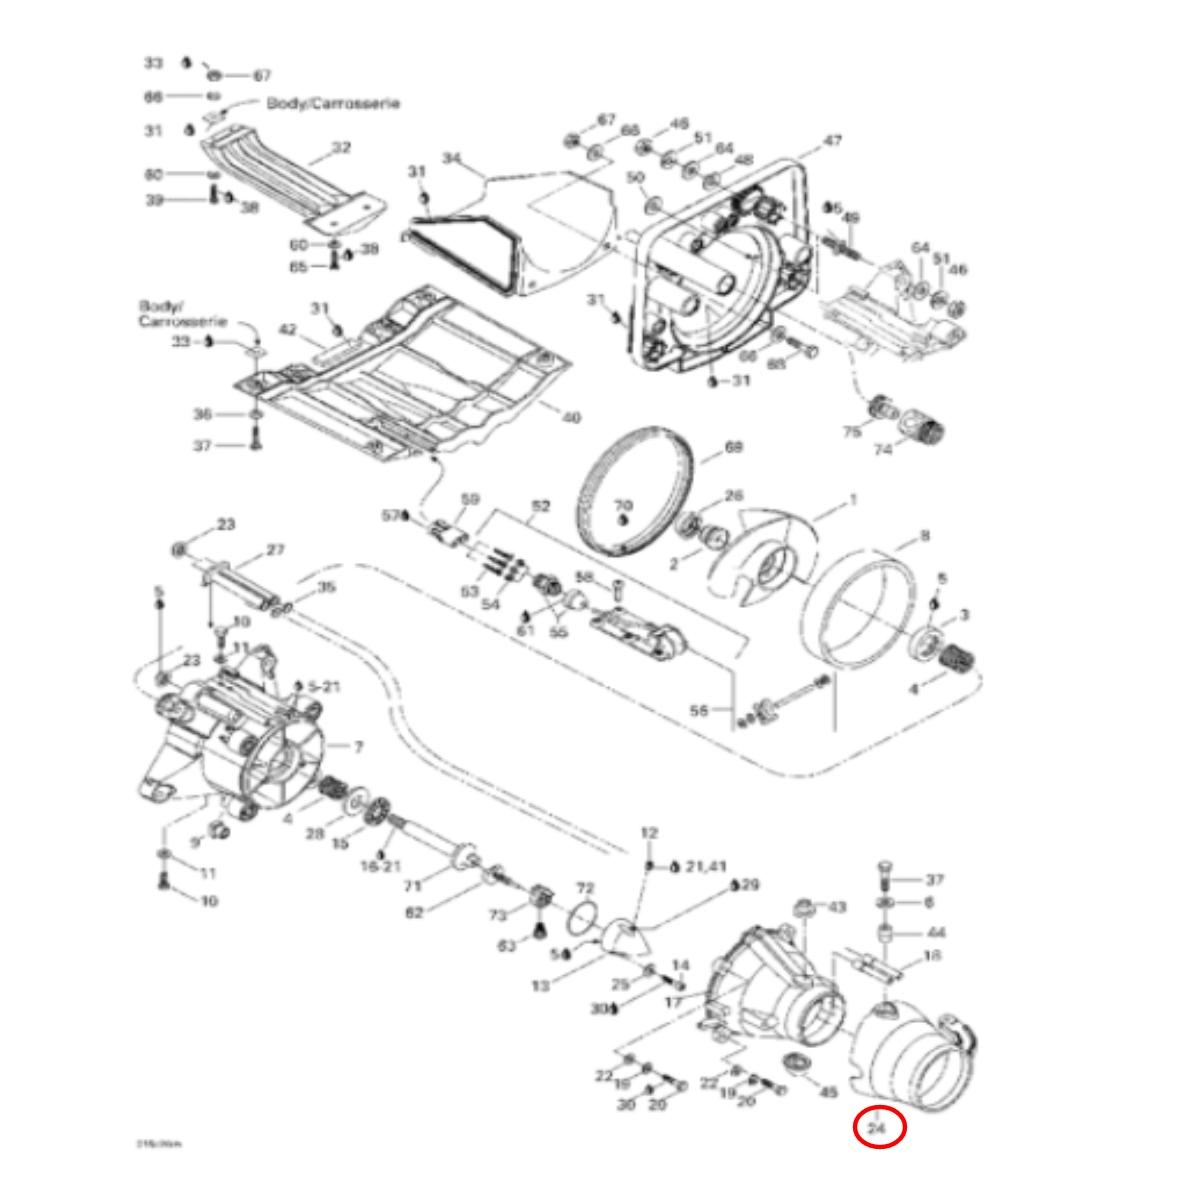 Bico Direcionador Jet Ski Sea Doo GTX Limit 98/00  - Radical Peças - Peças para Jet Ski